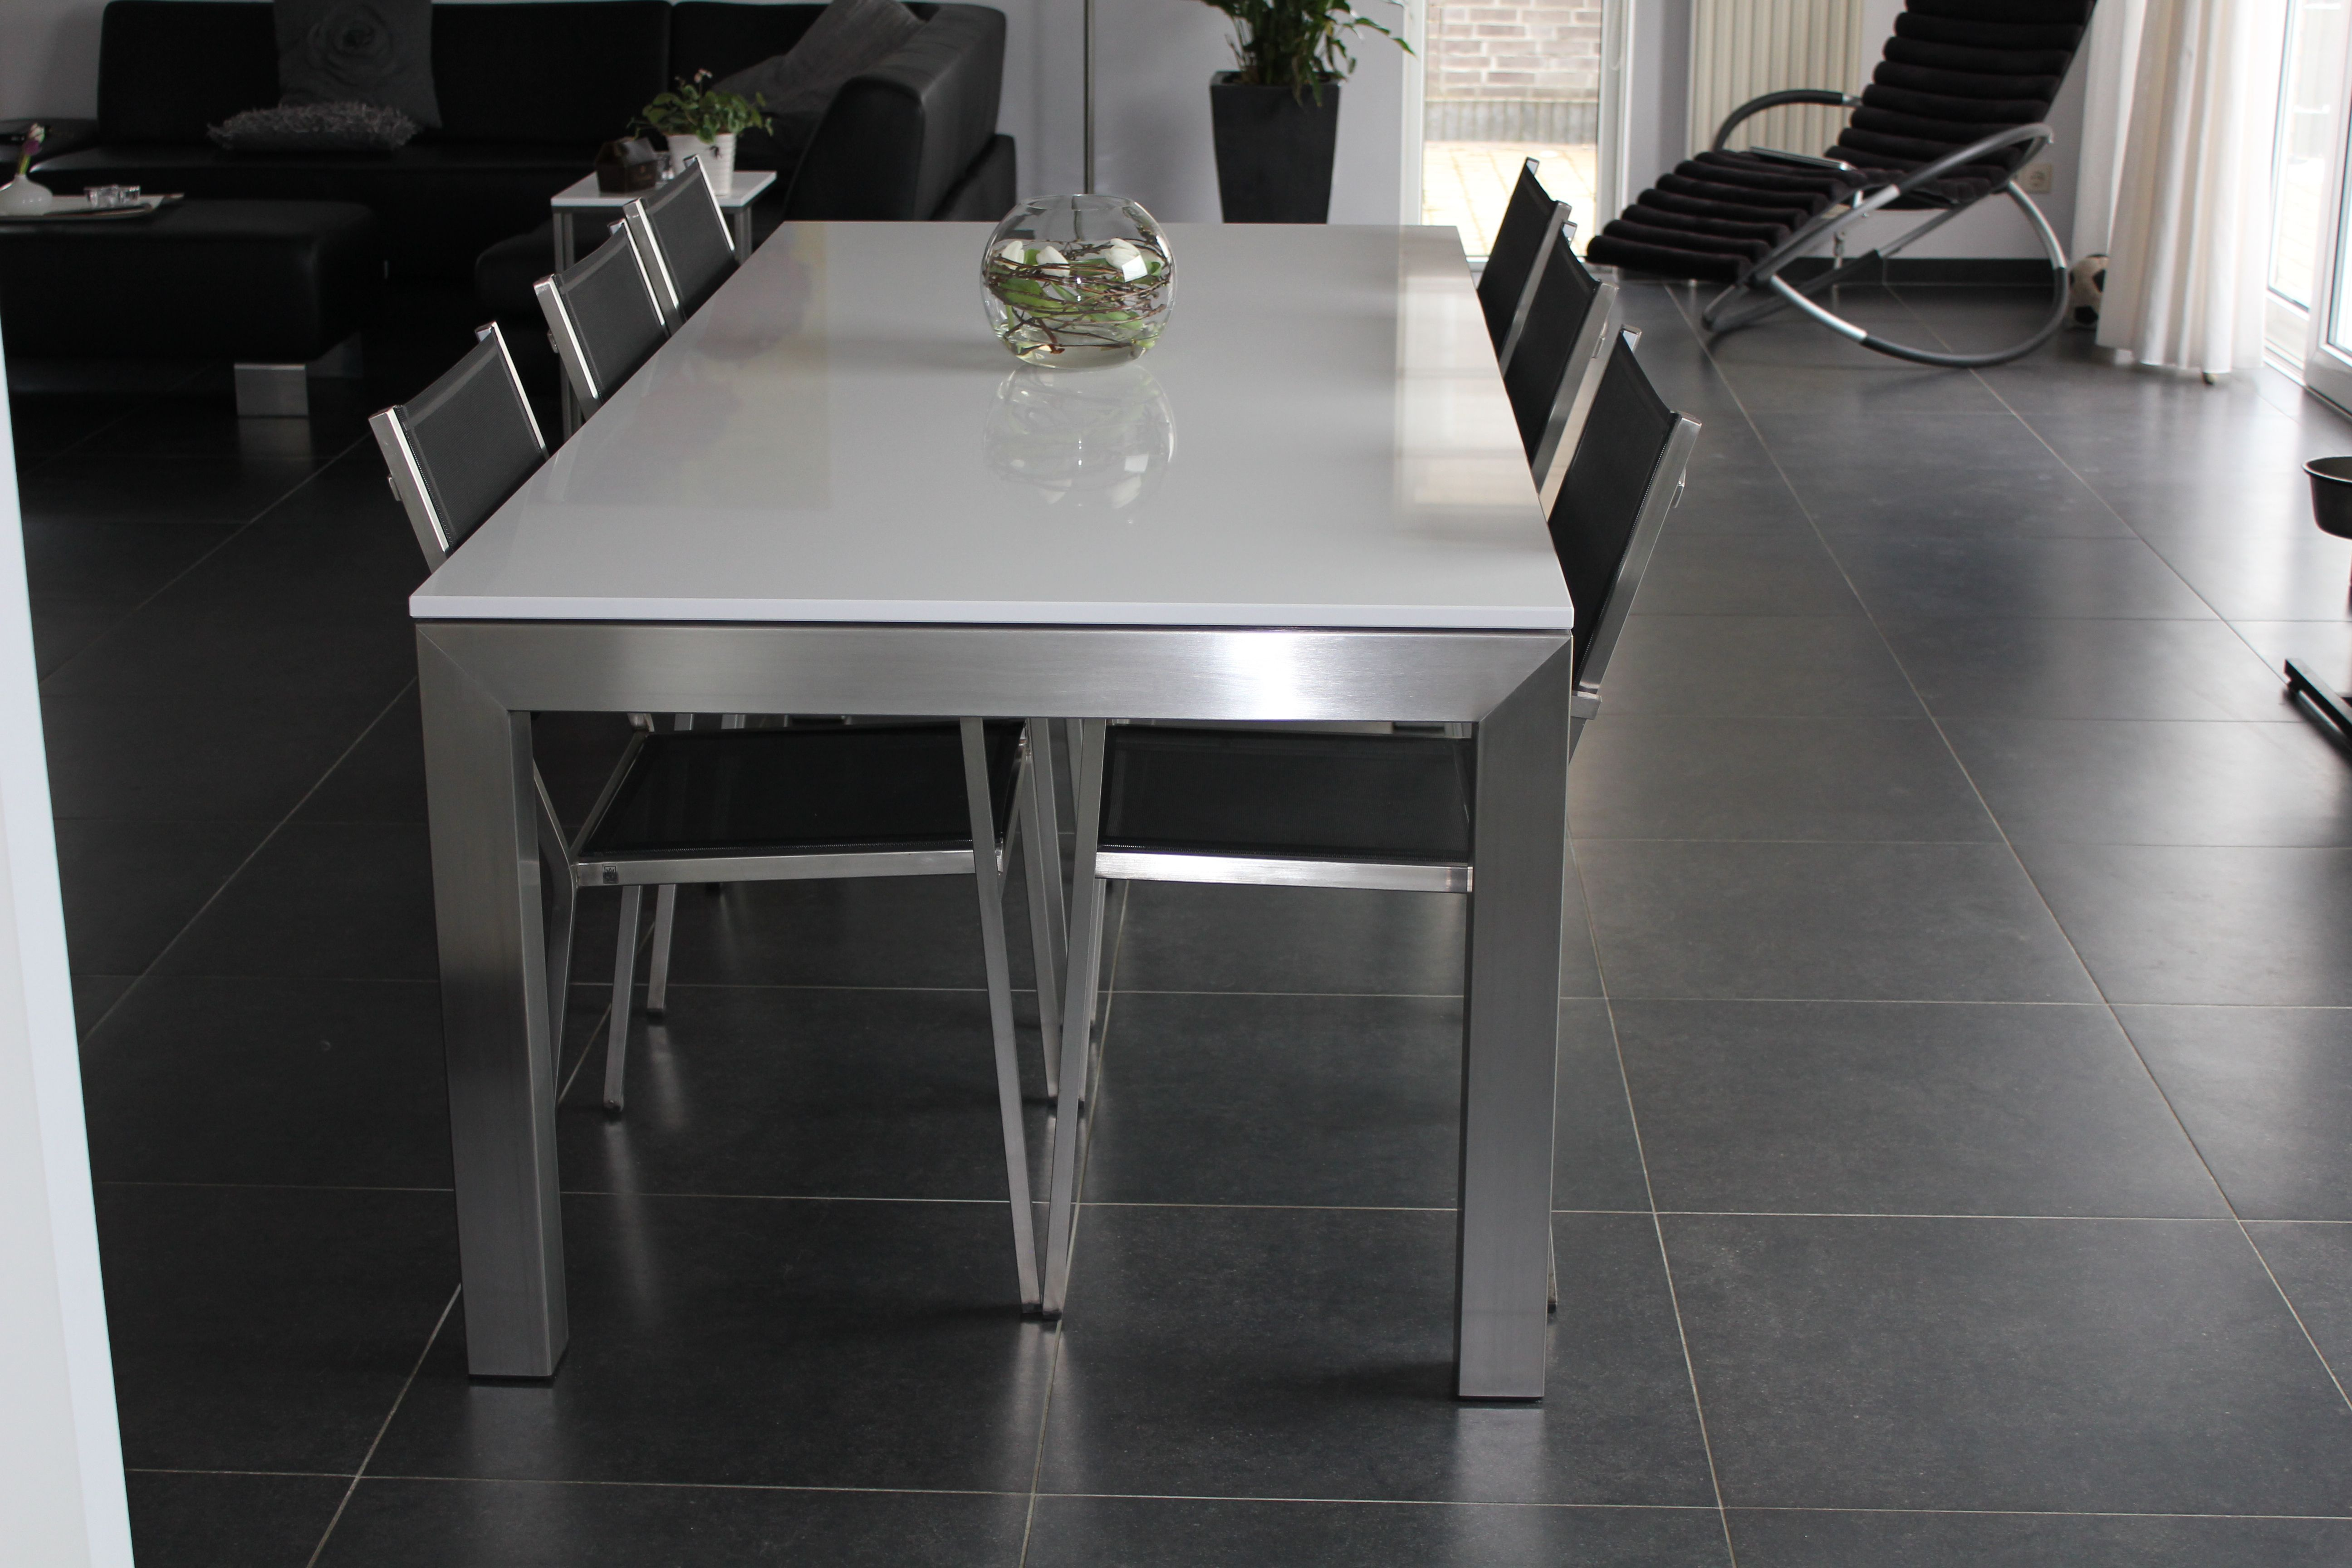 Tuintafel Met Glazen Tafelblad.Moderne Tafel Met Rvs Tafelpoten En Glazen Tafelblad